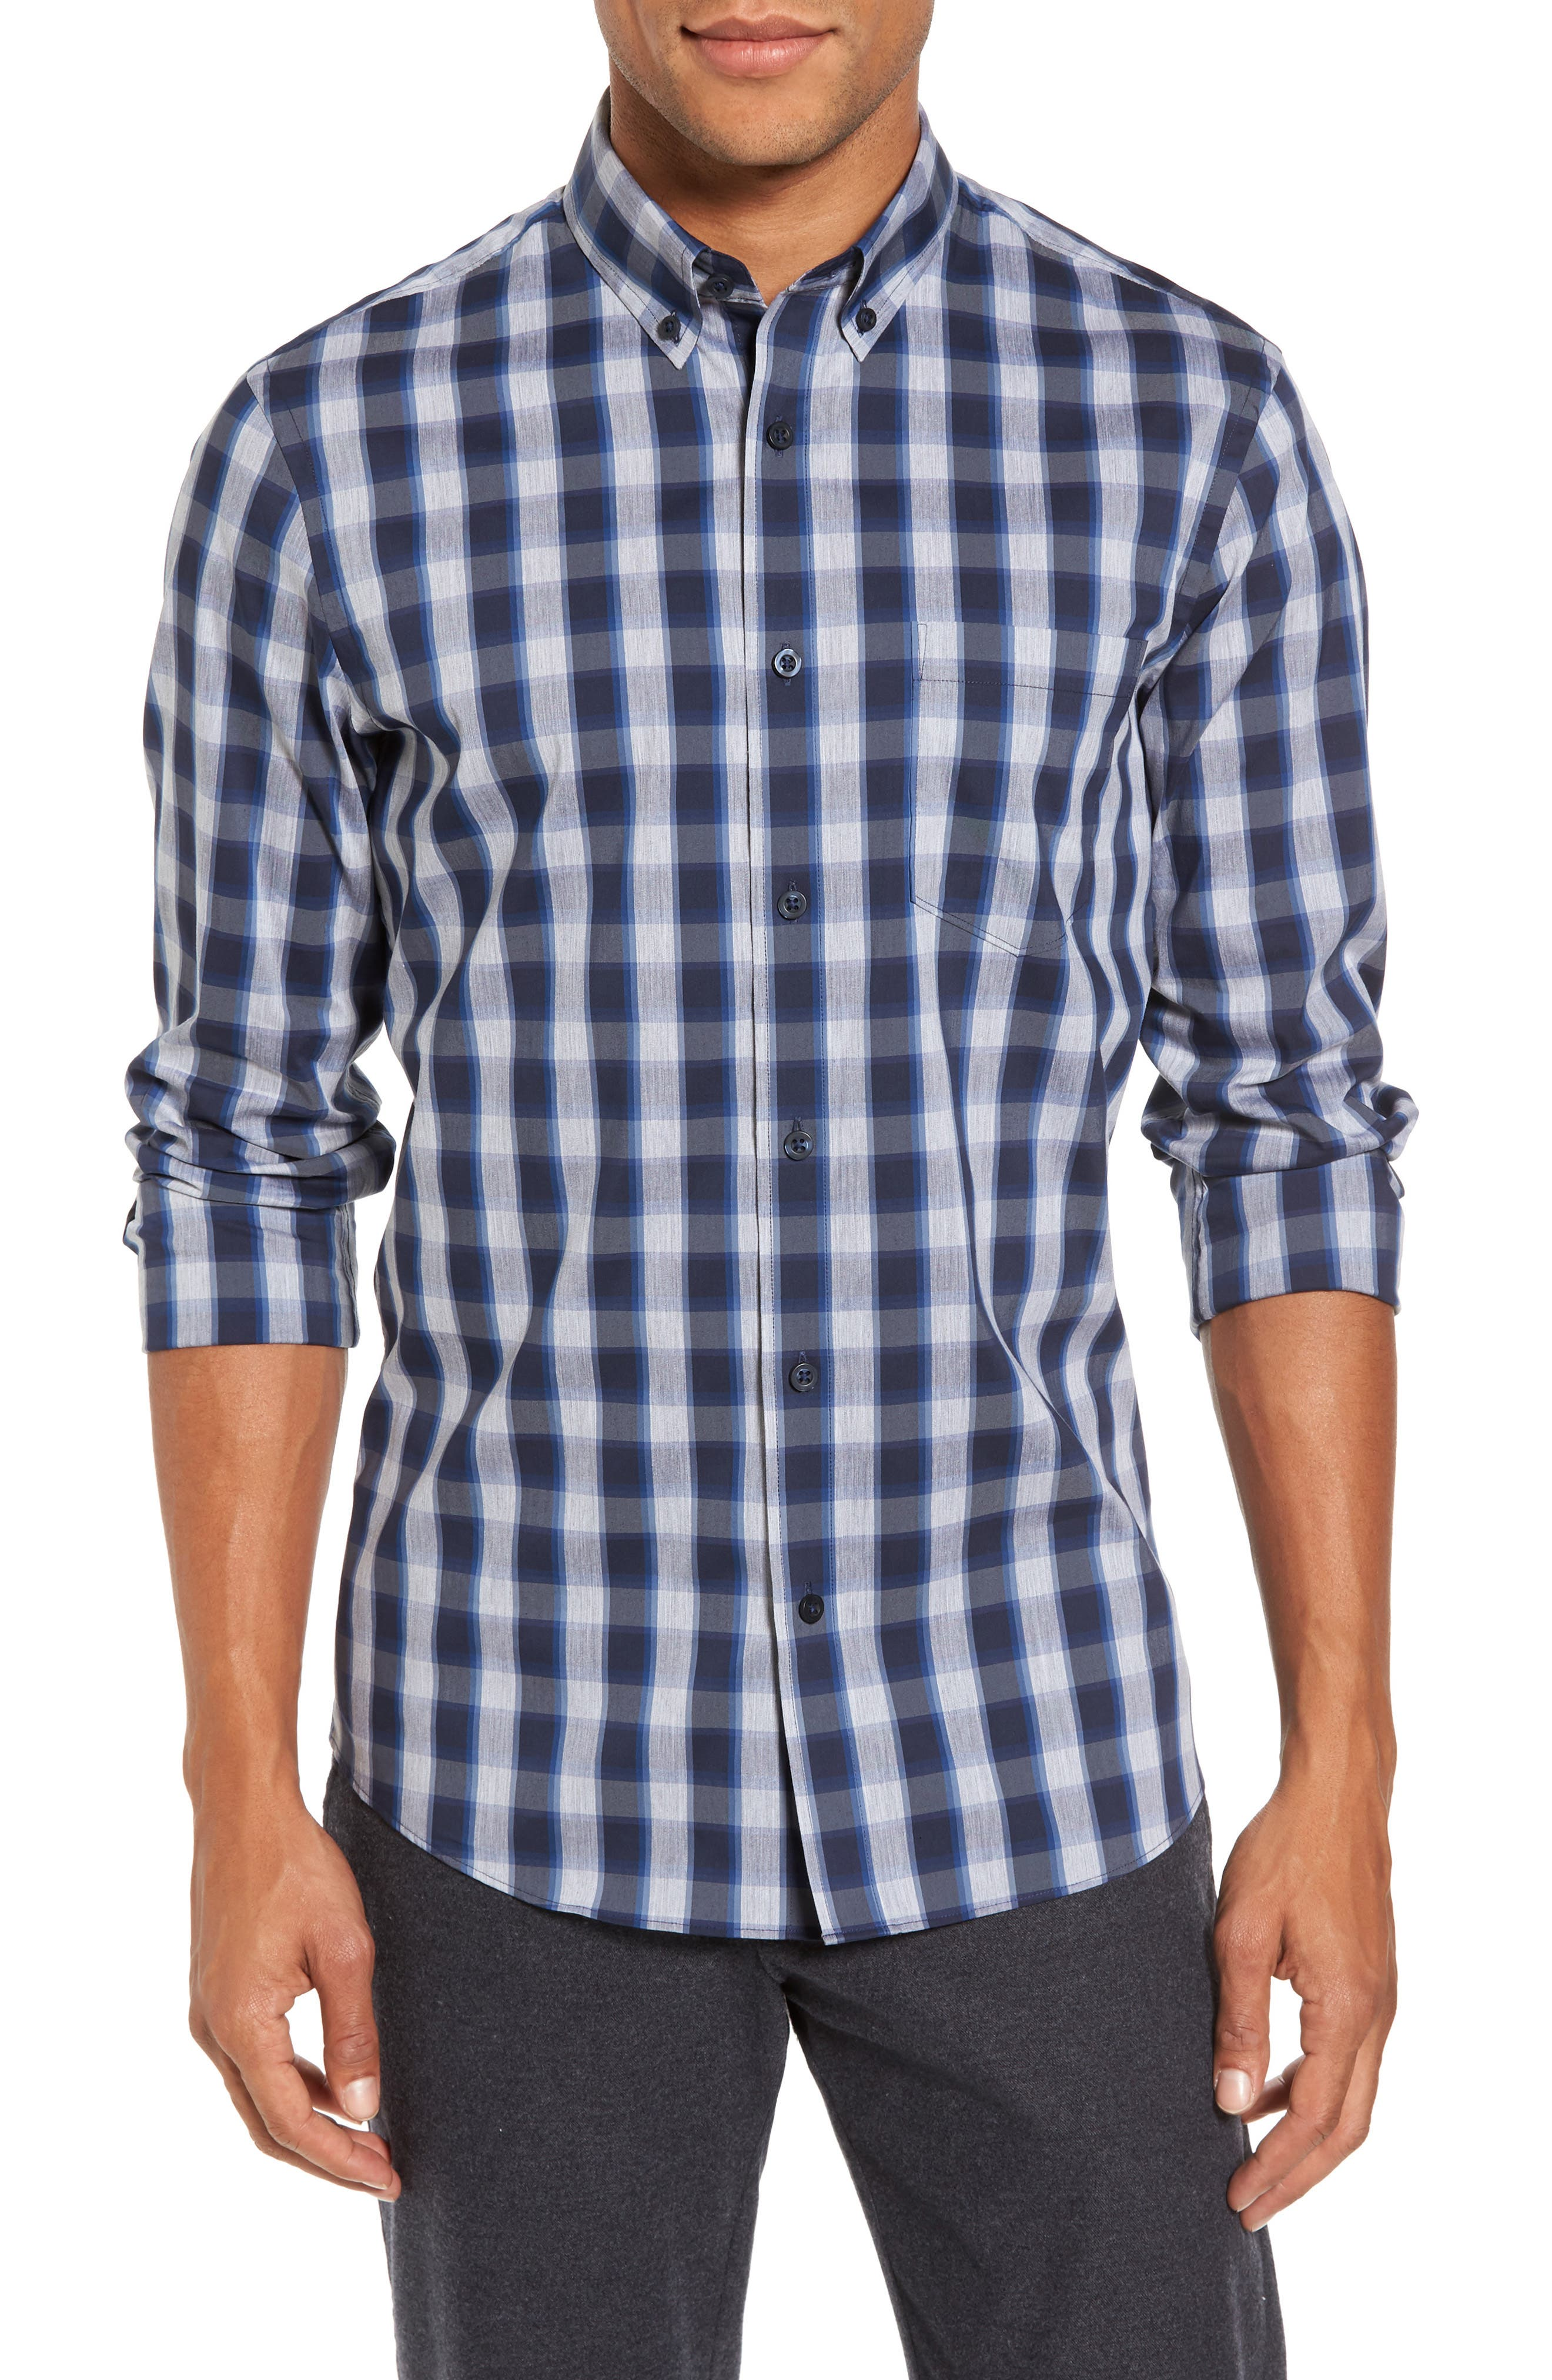 Spade Tech-Smart Trim Fit Check Sport Shirt,                         Main,                         color, Navy Iris Grey Heather Check